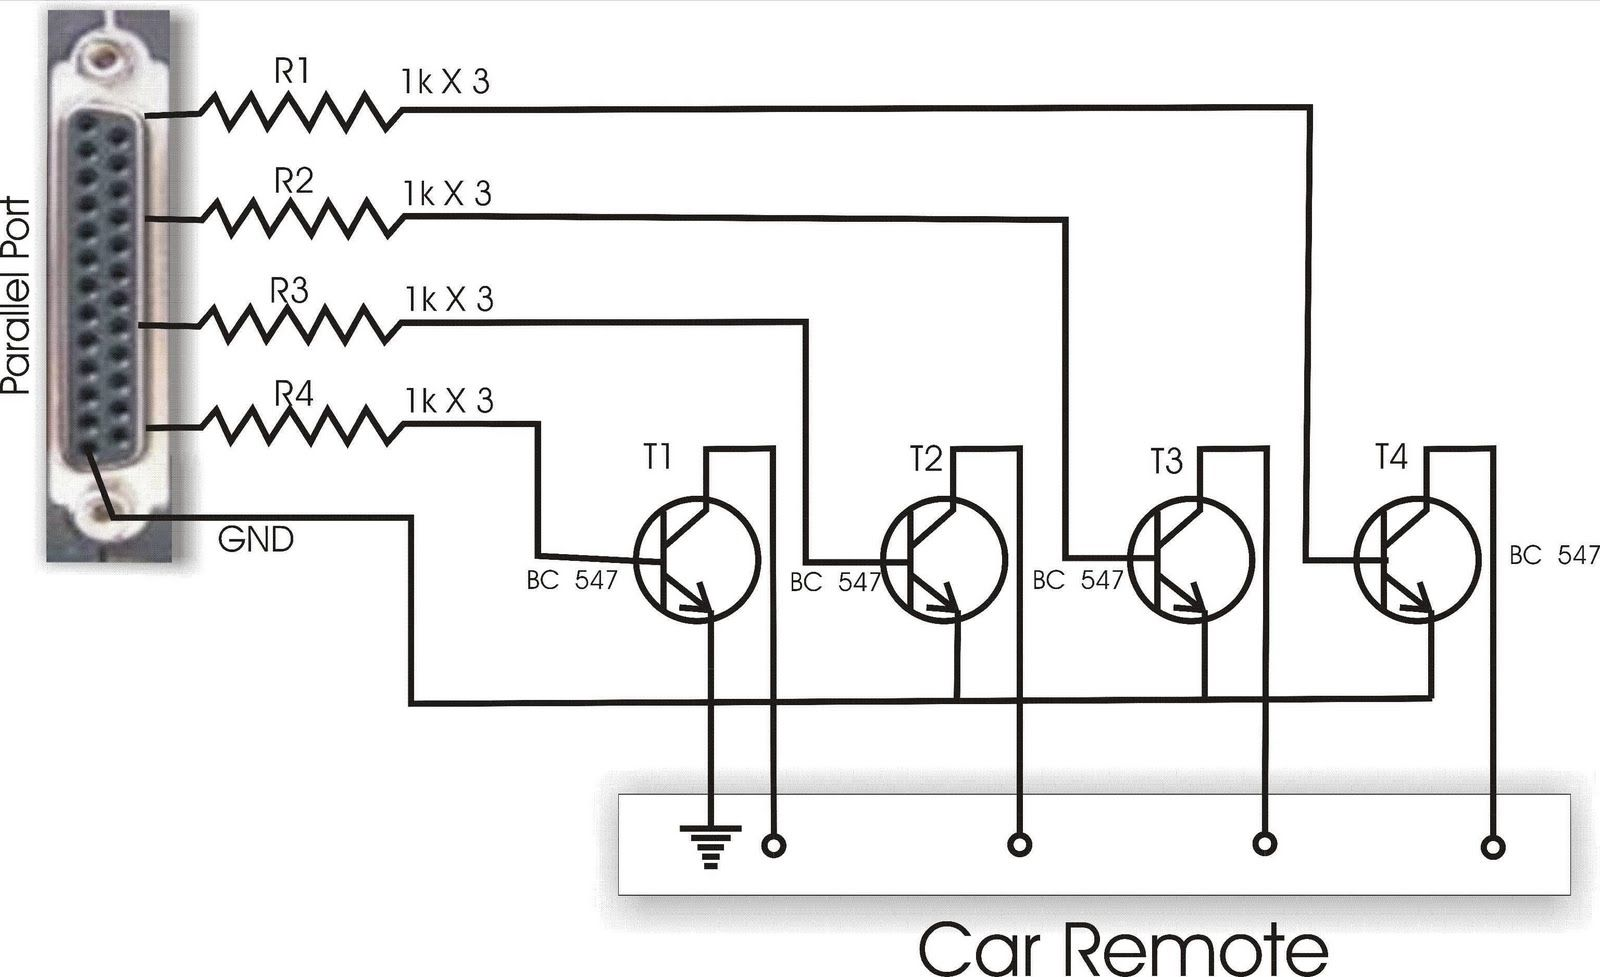 Computer Control RC Car circuit diagram | Electronic